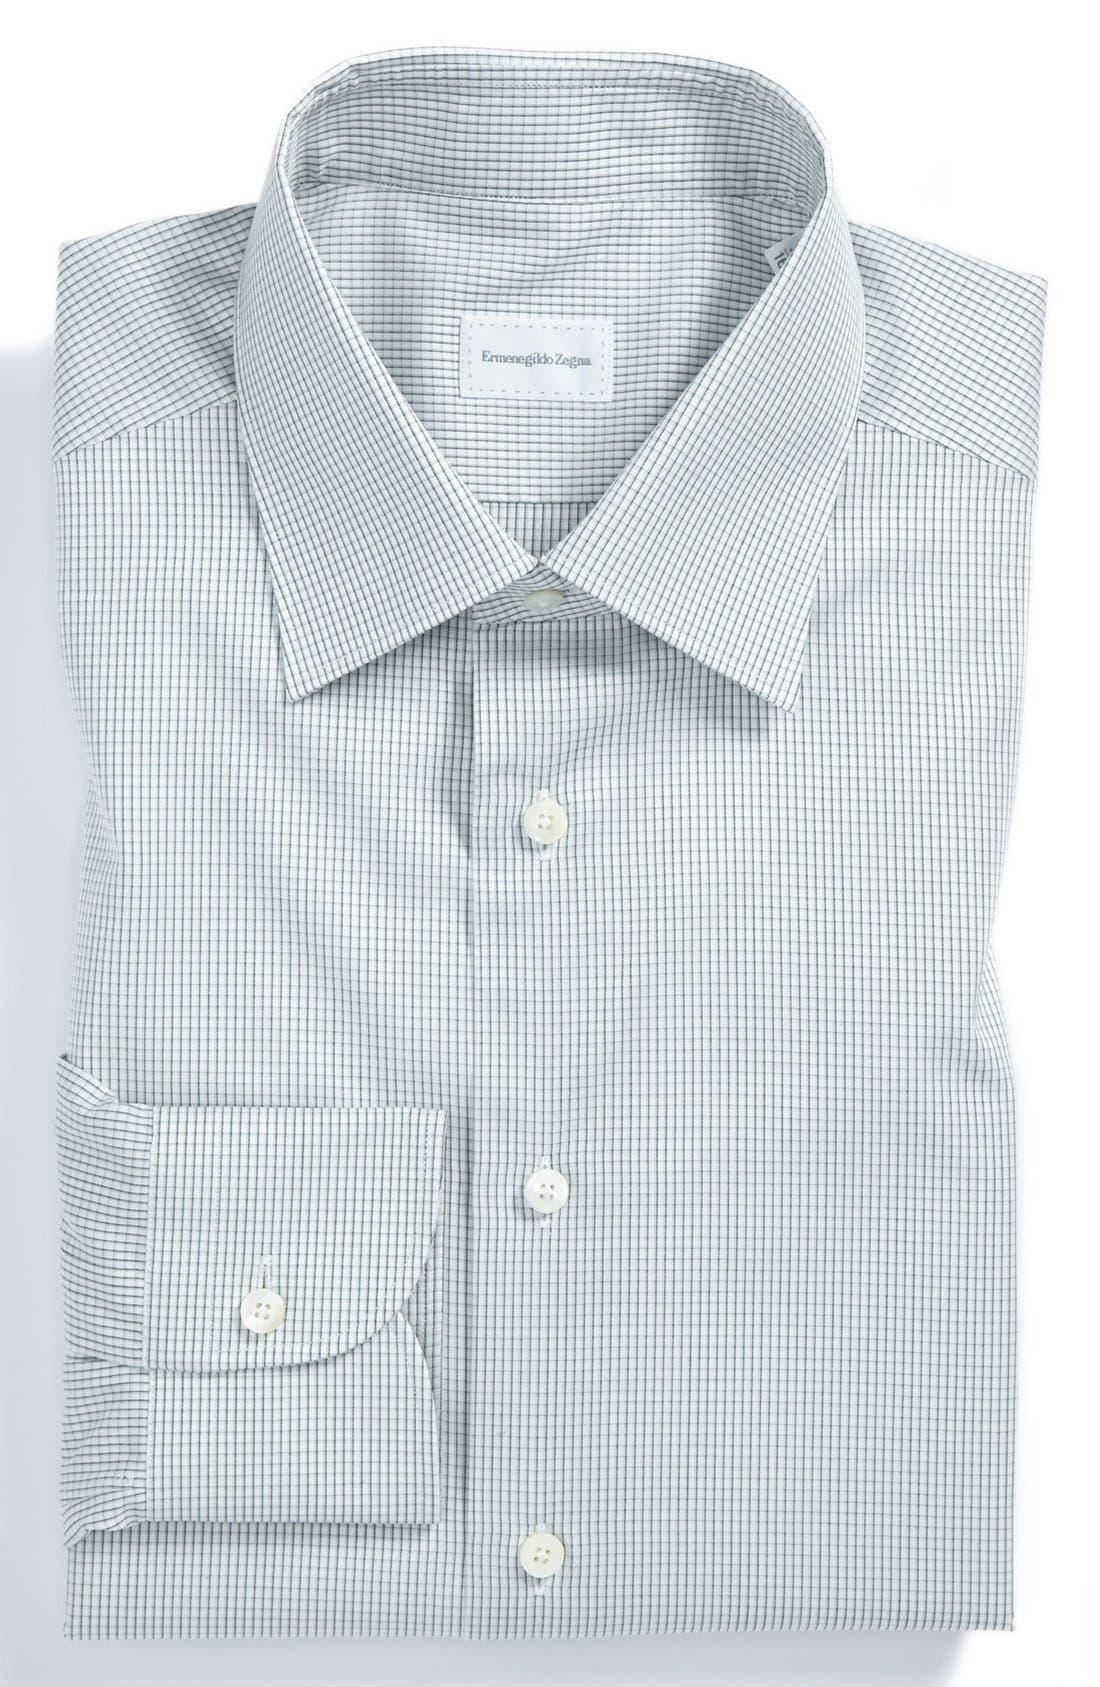 Regular Fit Dress Shirt,                         Main,                         color, 306